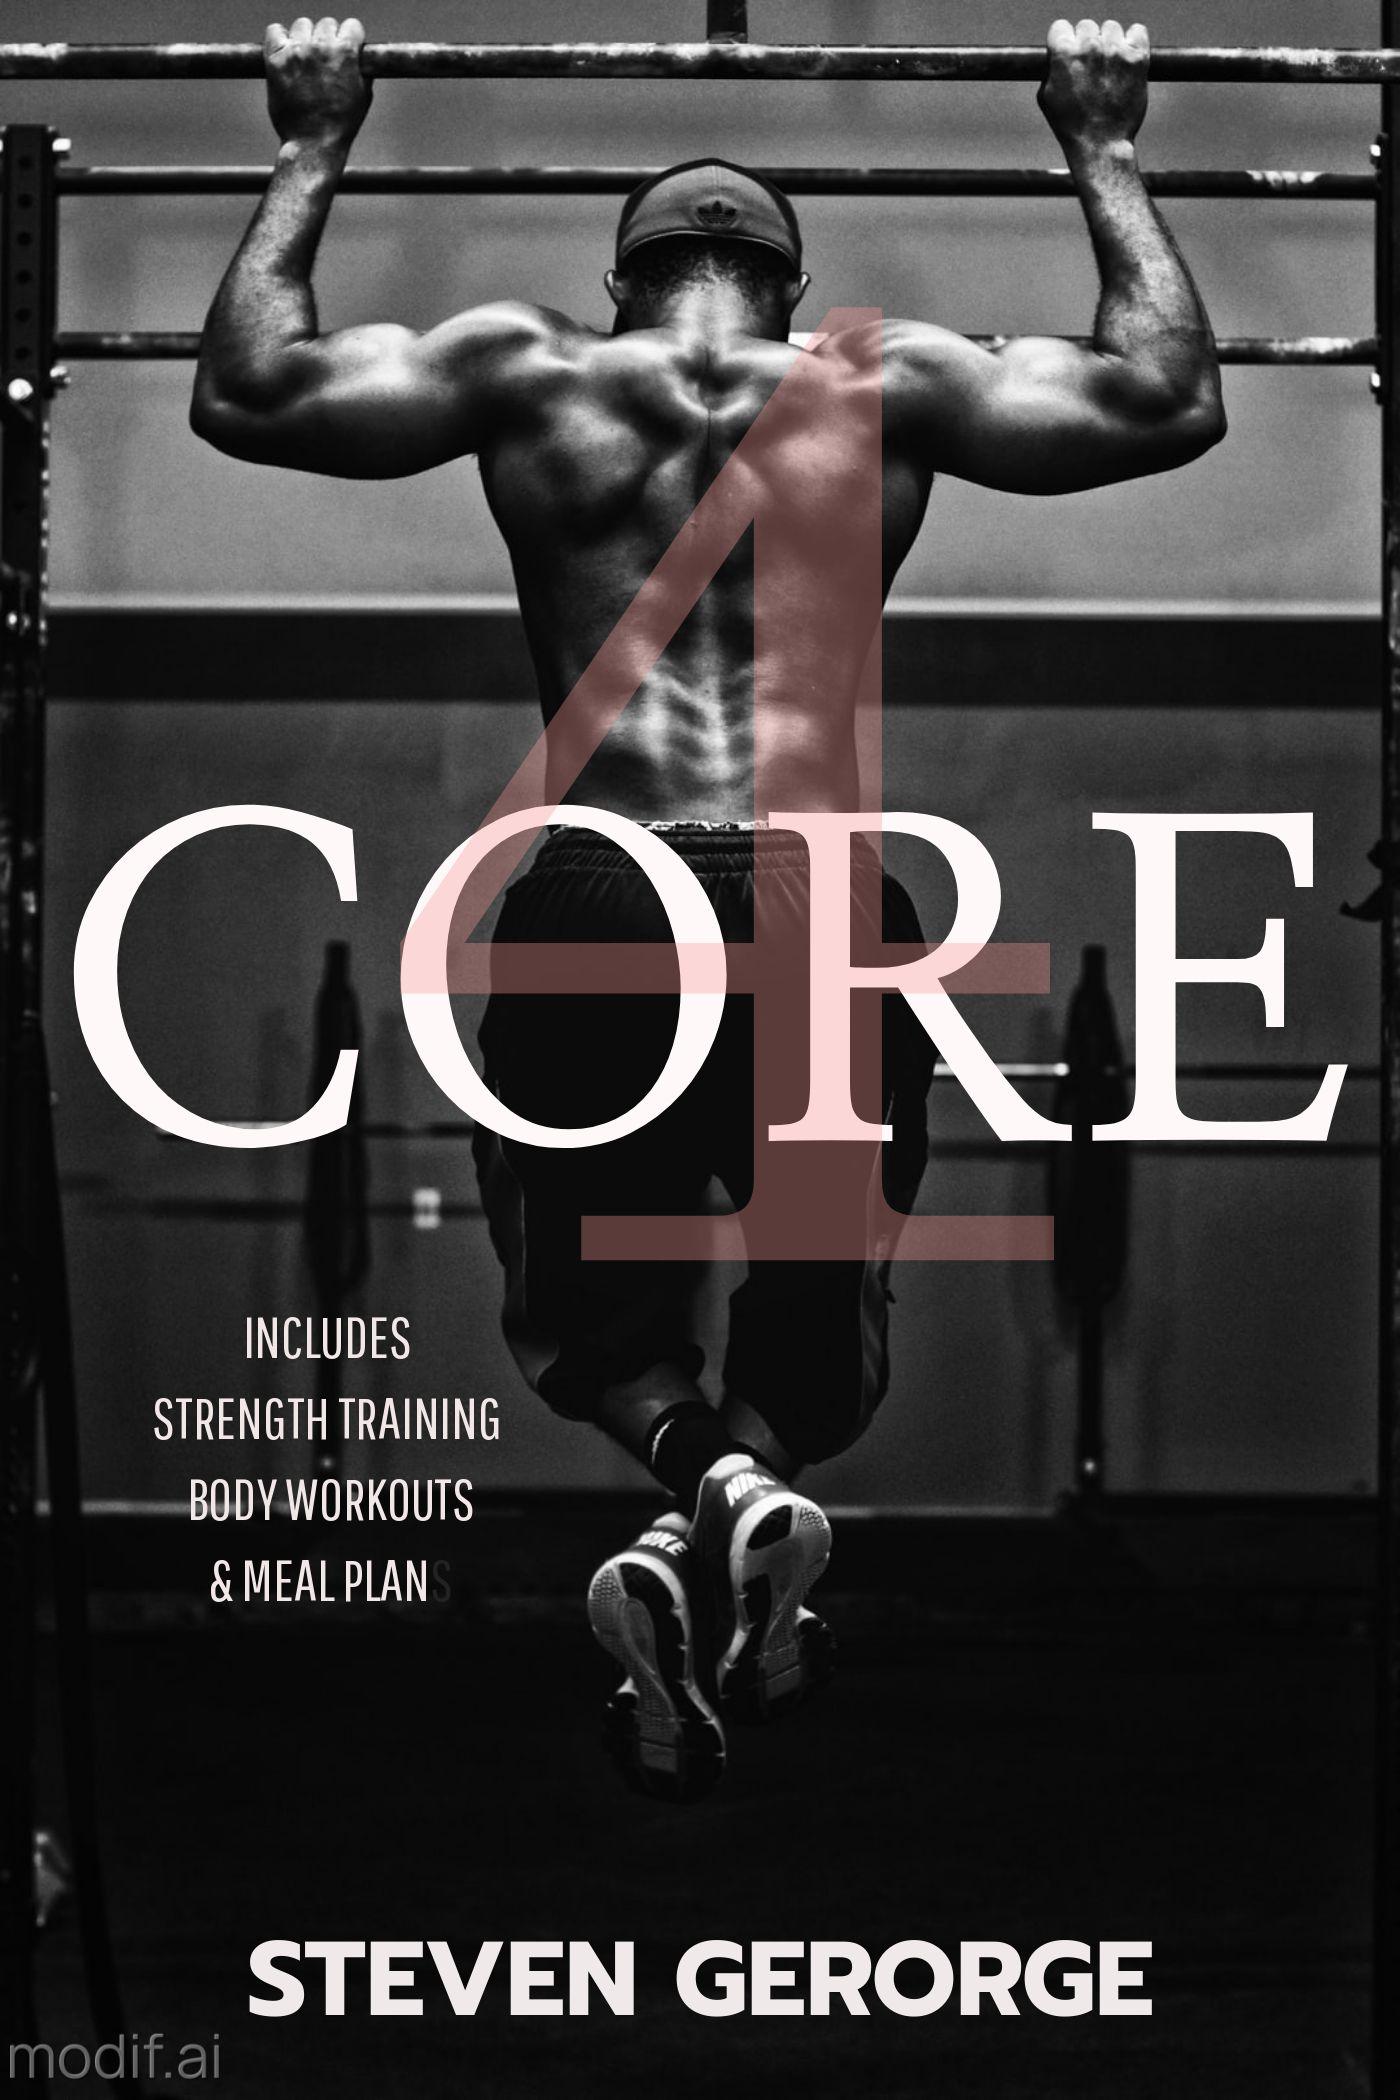 Core Gym Training Book Cover Maker